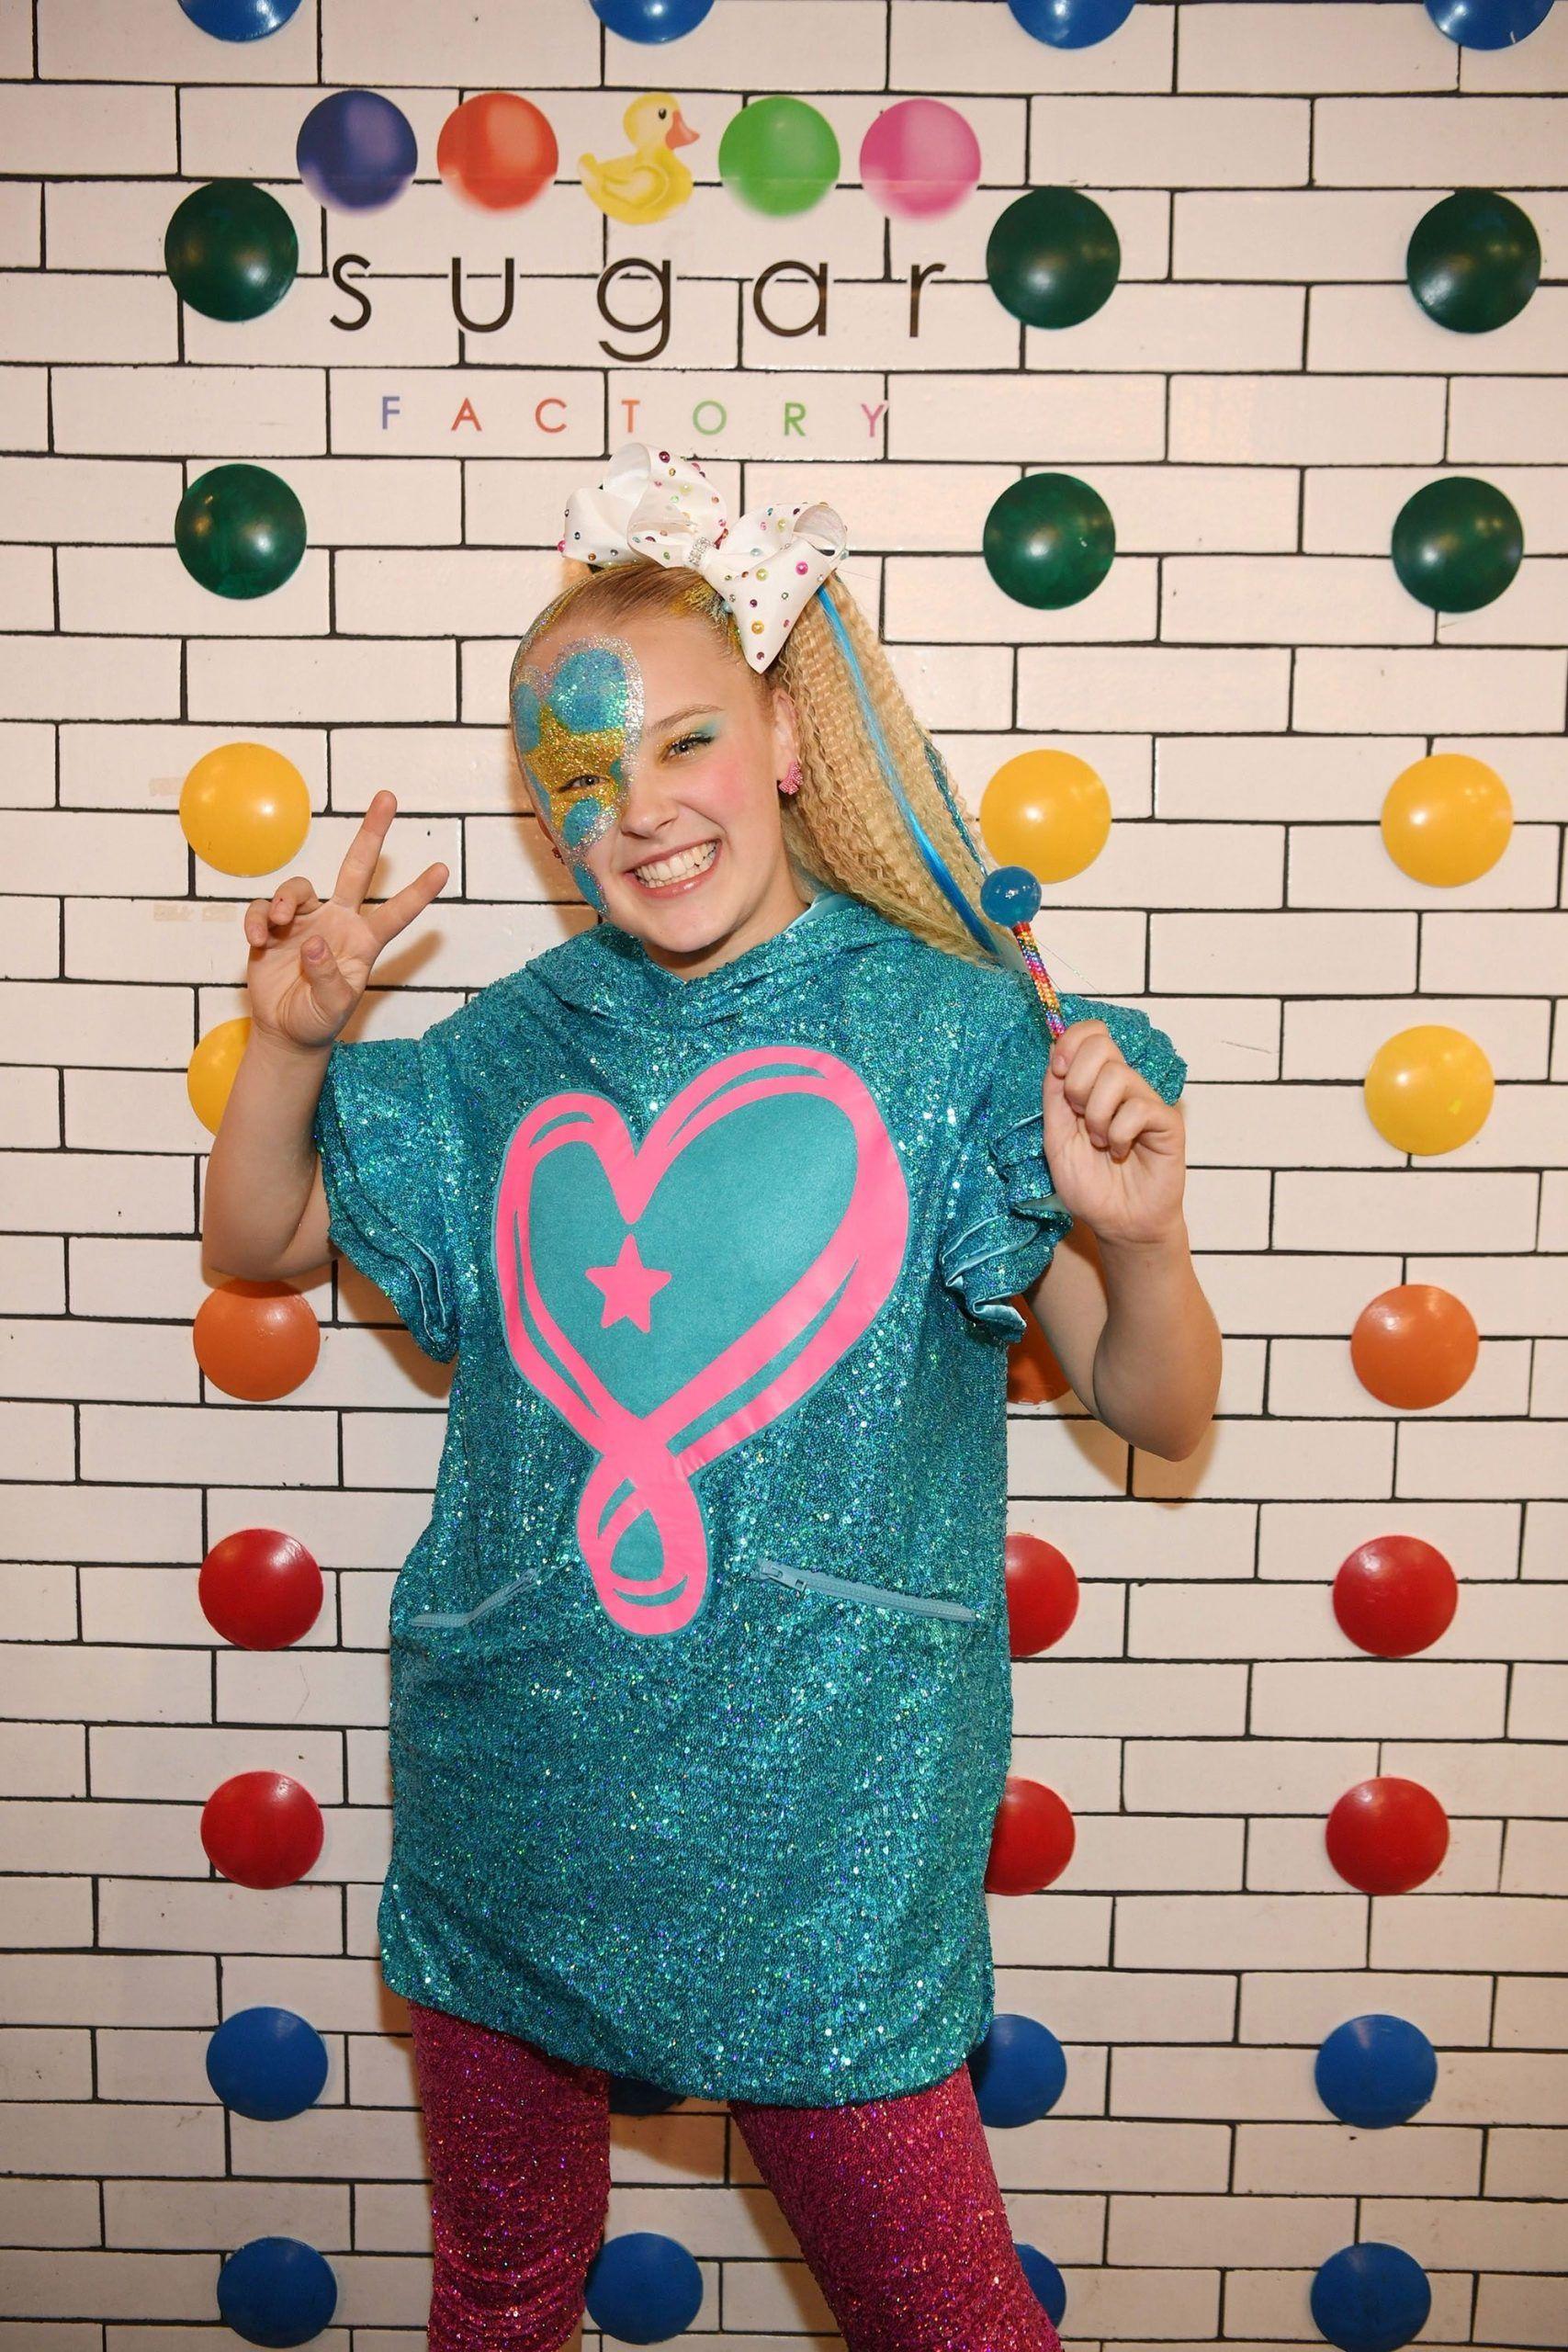 JoJo Siwa Dyed Her Trademark Blonde Ponytail Brown and